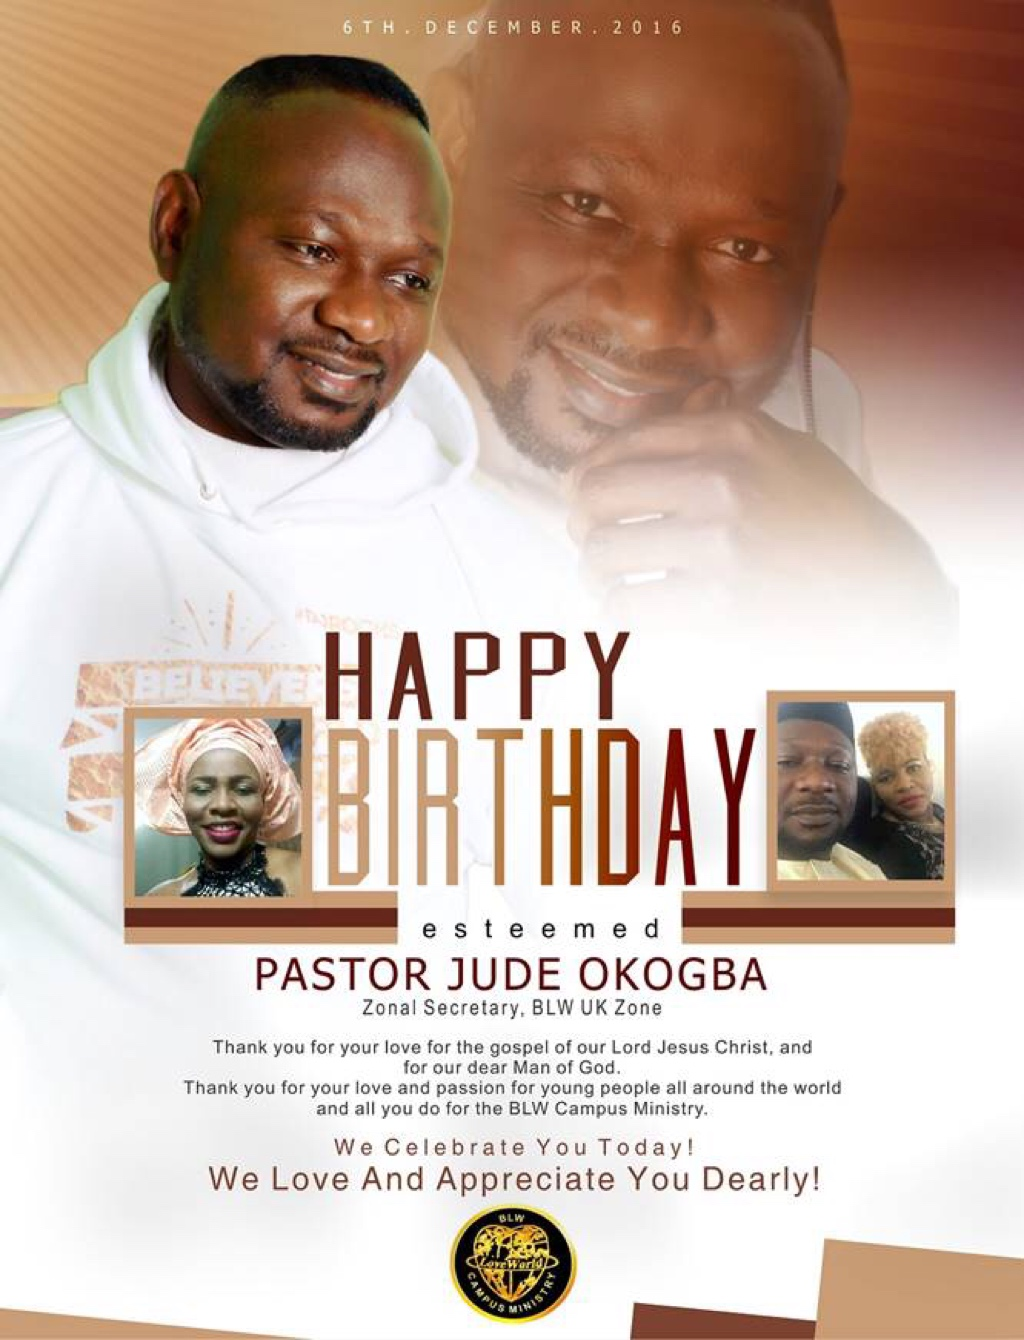 Happy Birthday Pastor Jude Sir!